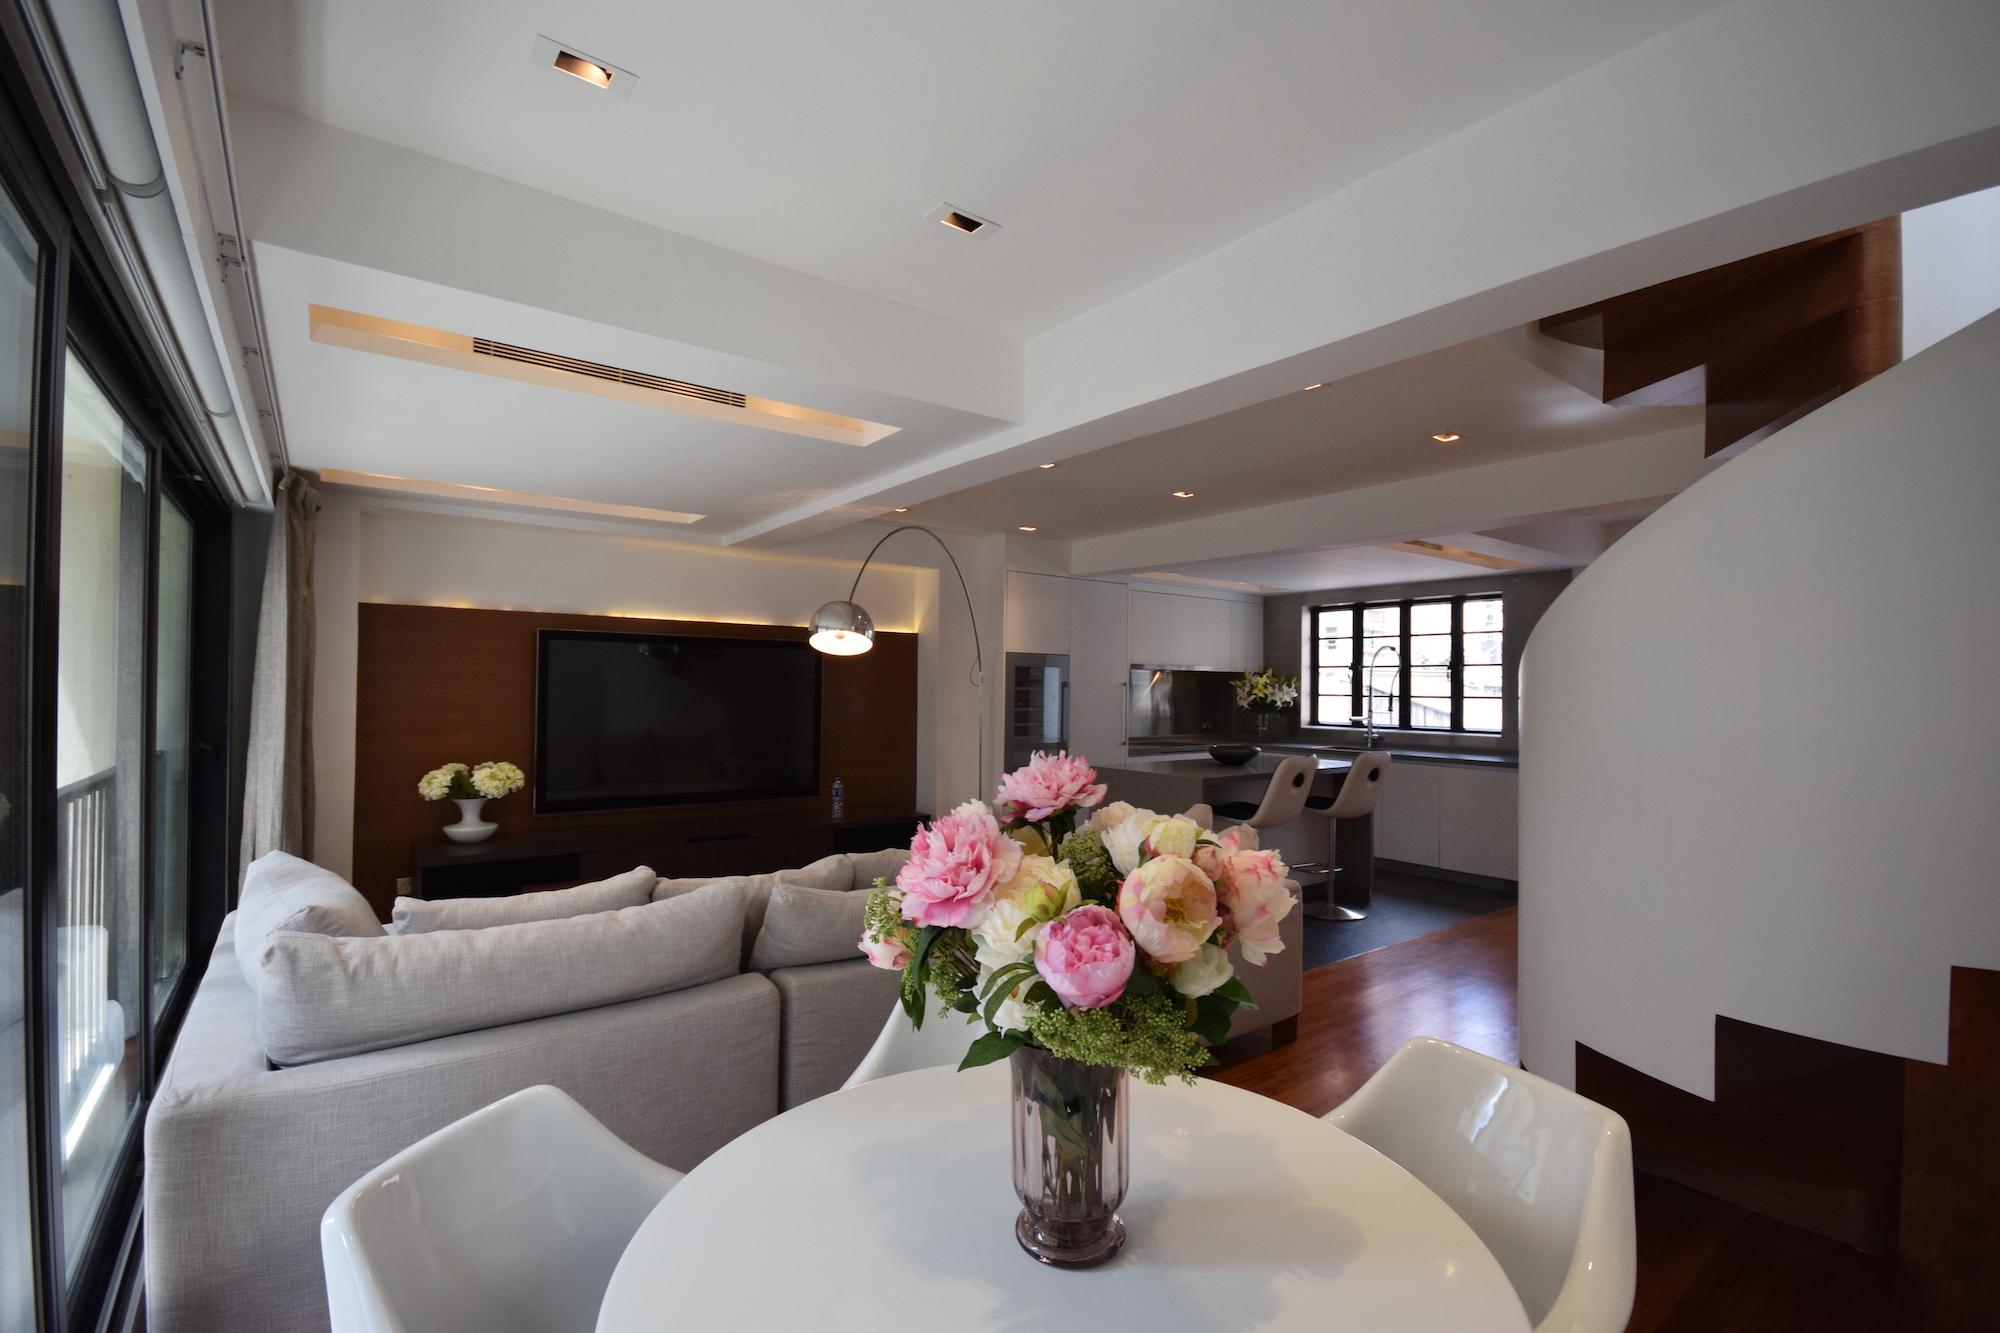 68 PEEL STREET DUPLEX (SOLE AGENT) HK$26M  Peel Street, Soho